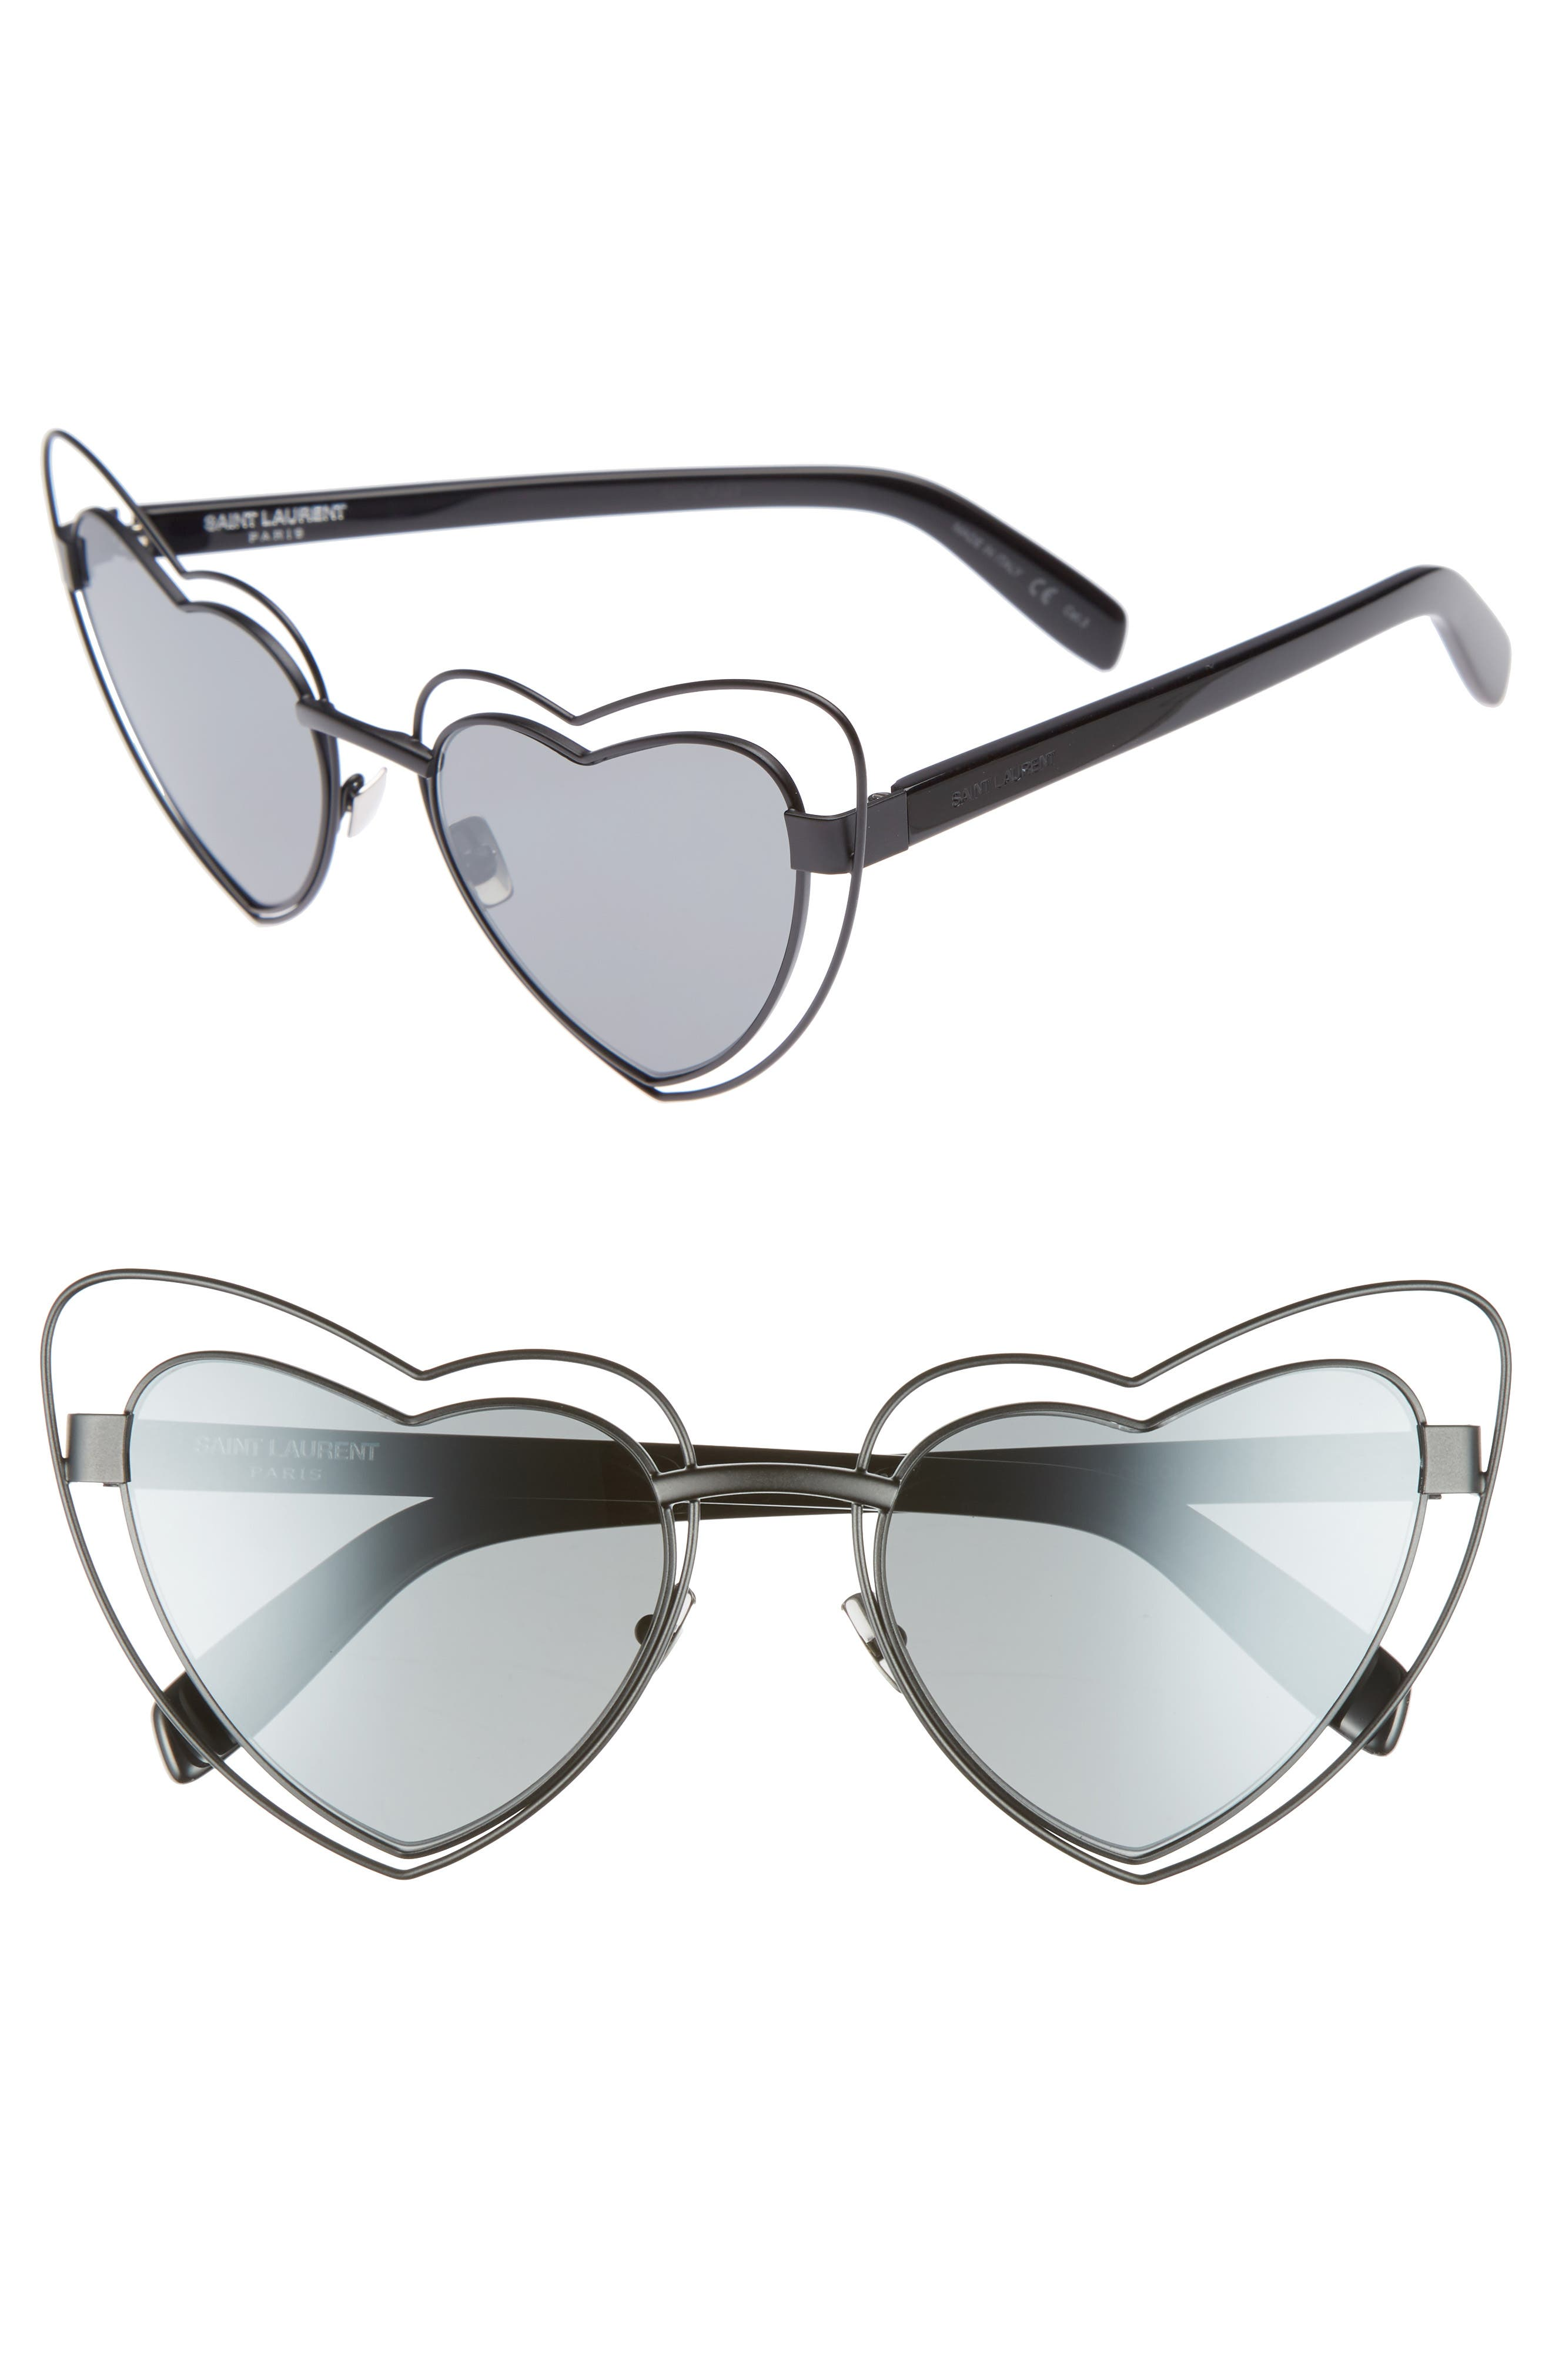 Alternate Image 1 Selected - Saint Laurent SL197 LouLou 57mm Heart Shaped Sunglasses